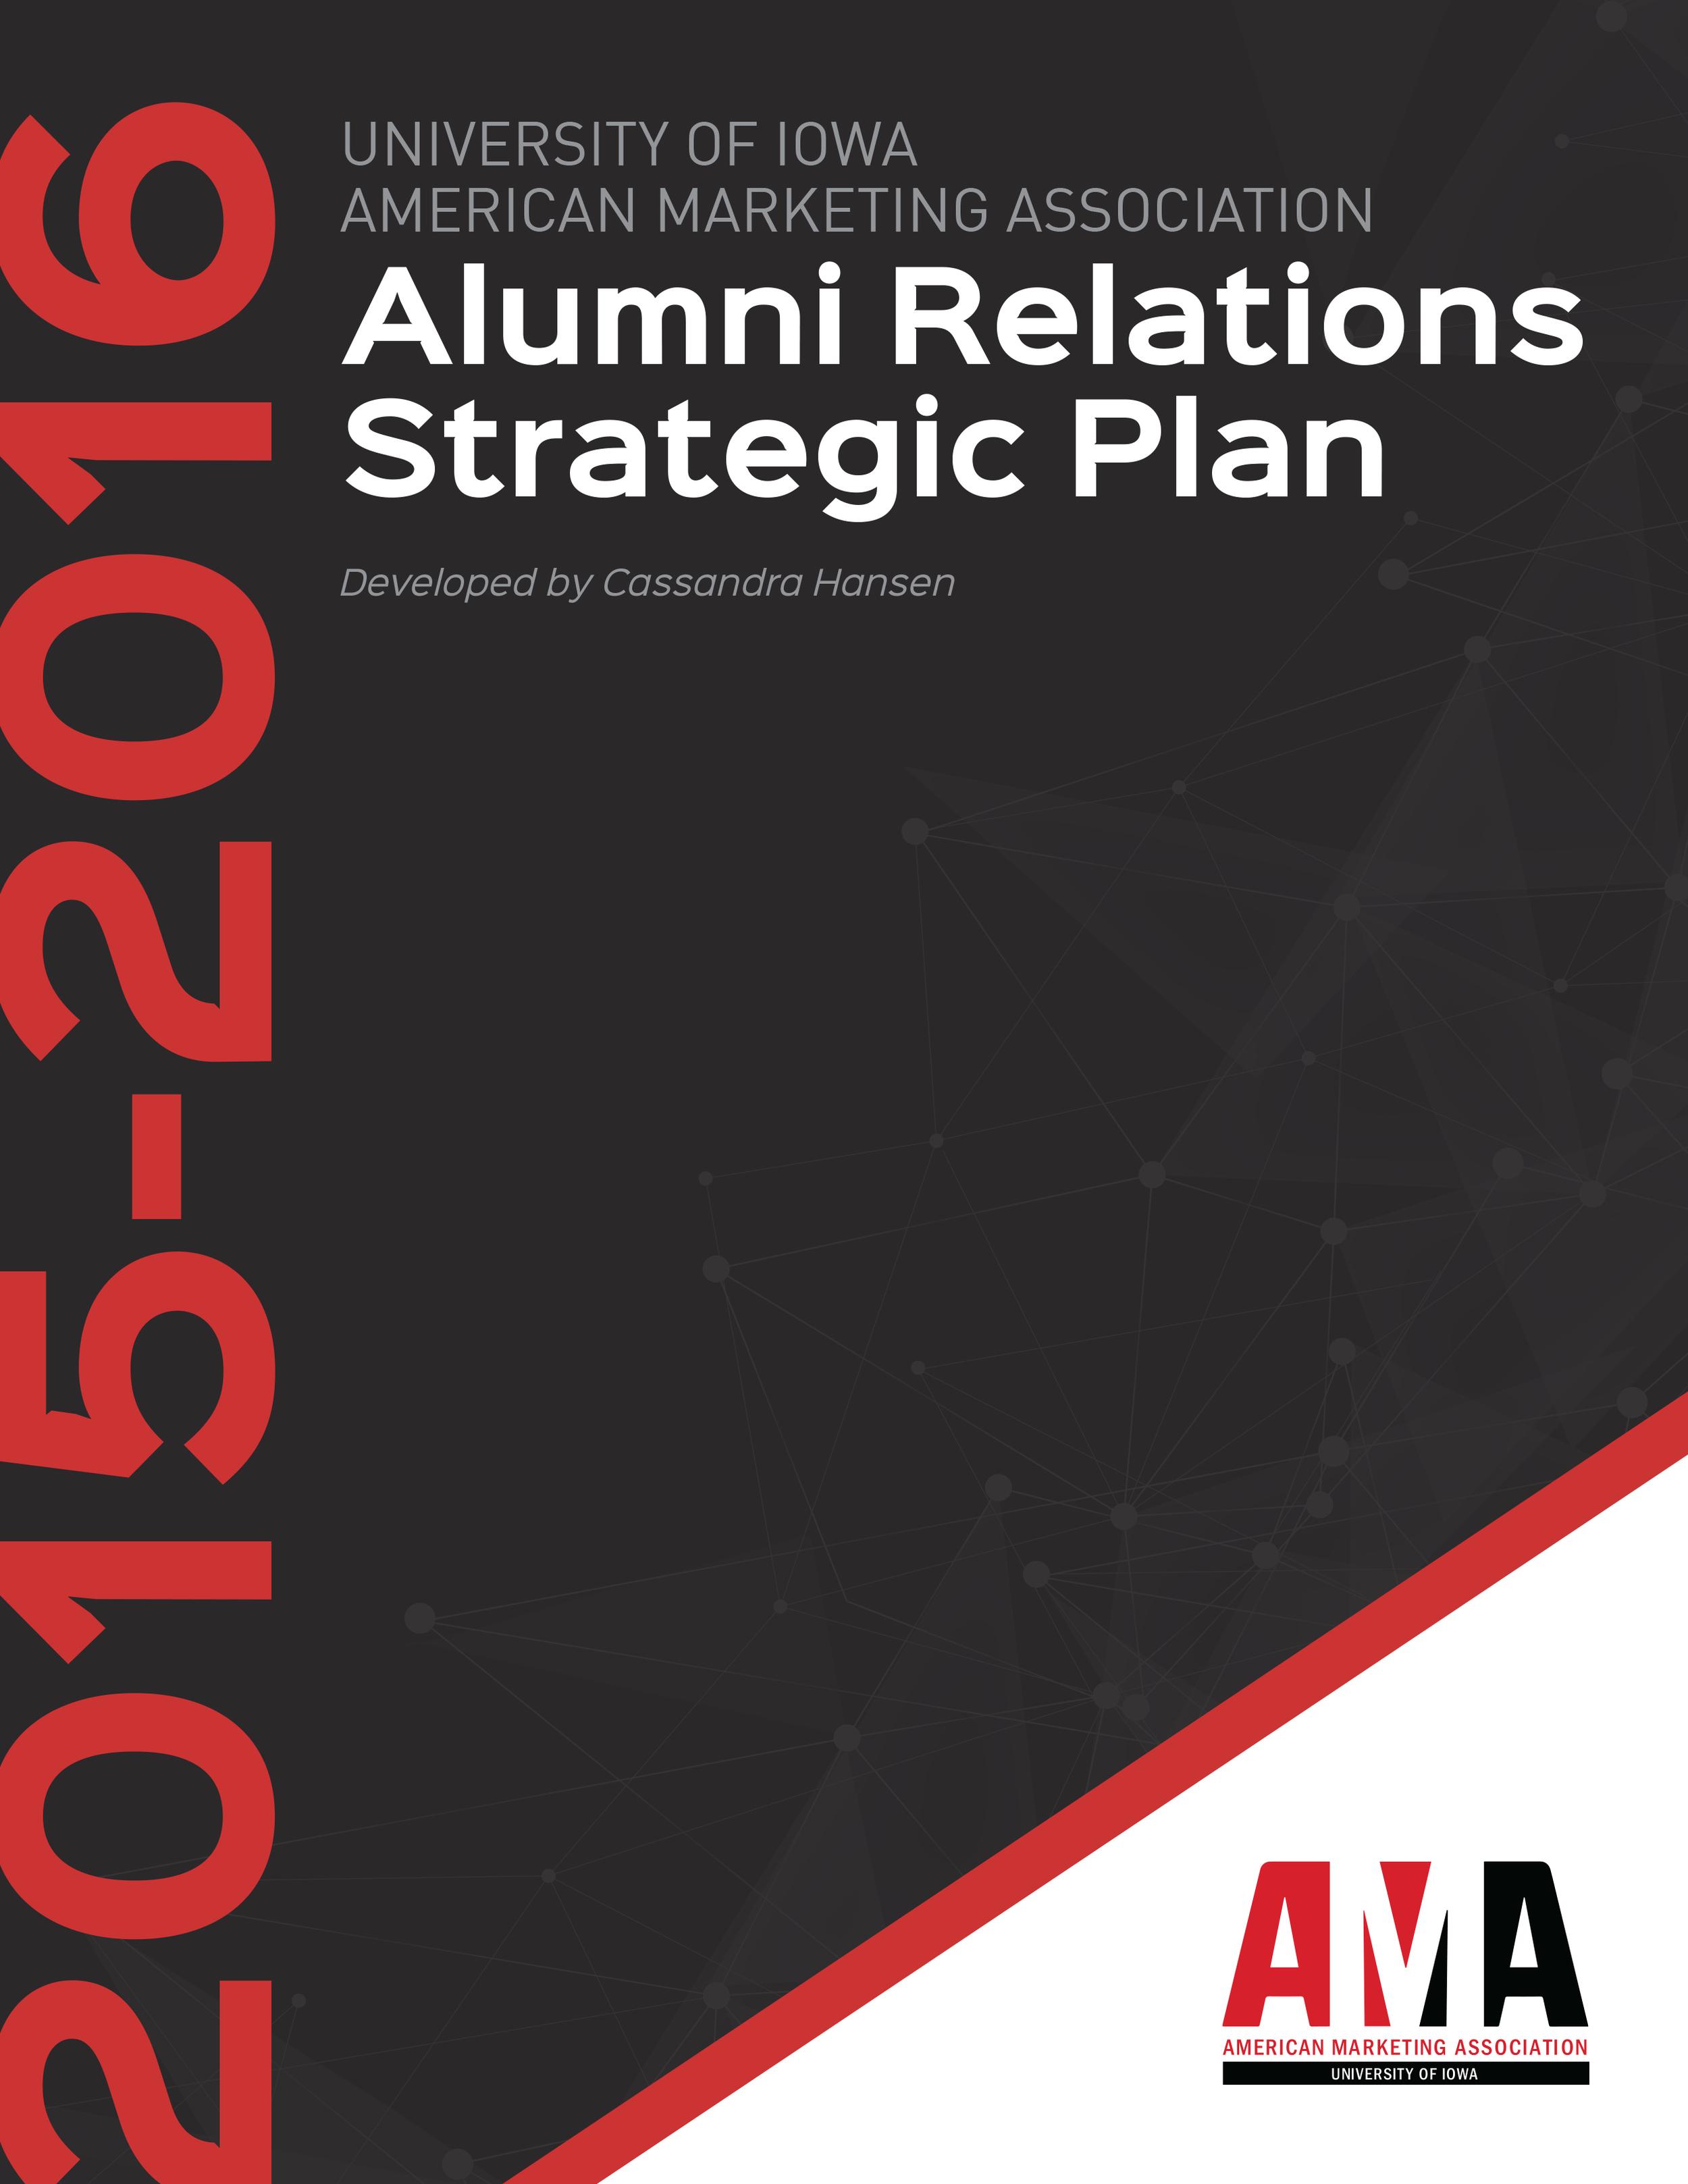 ama_alumnistrategicplan-1.jpg